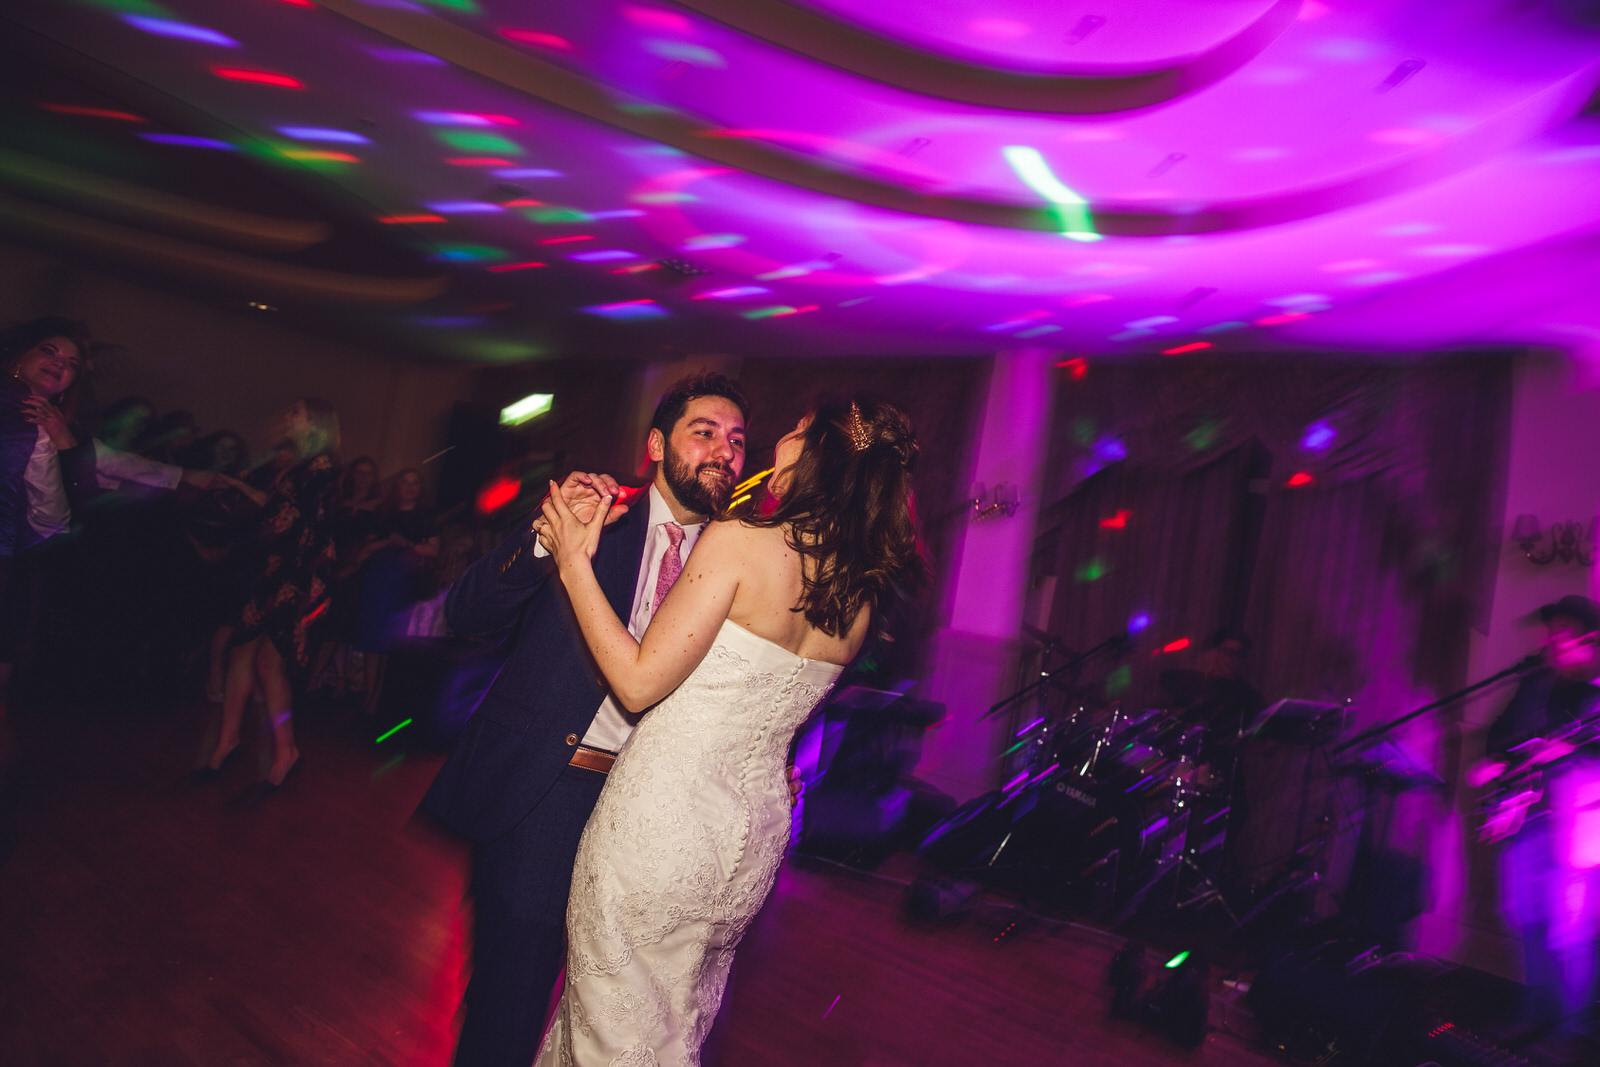 Roger-kenny-wedding-photographer-greystones-wicklow-dublin_126.jpg